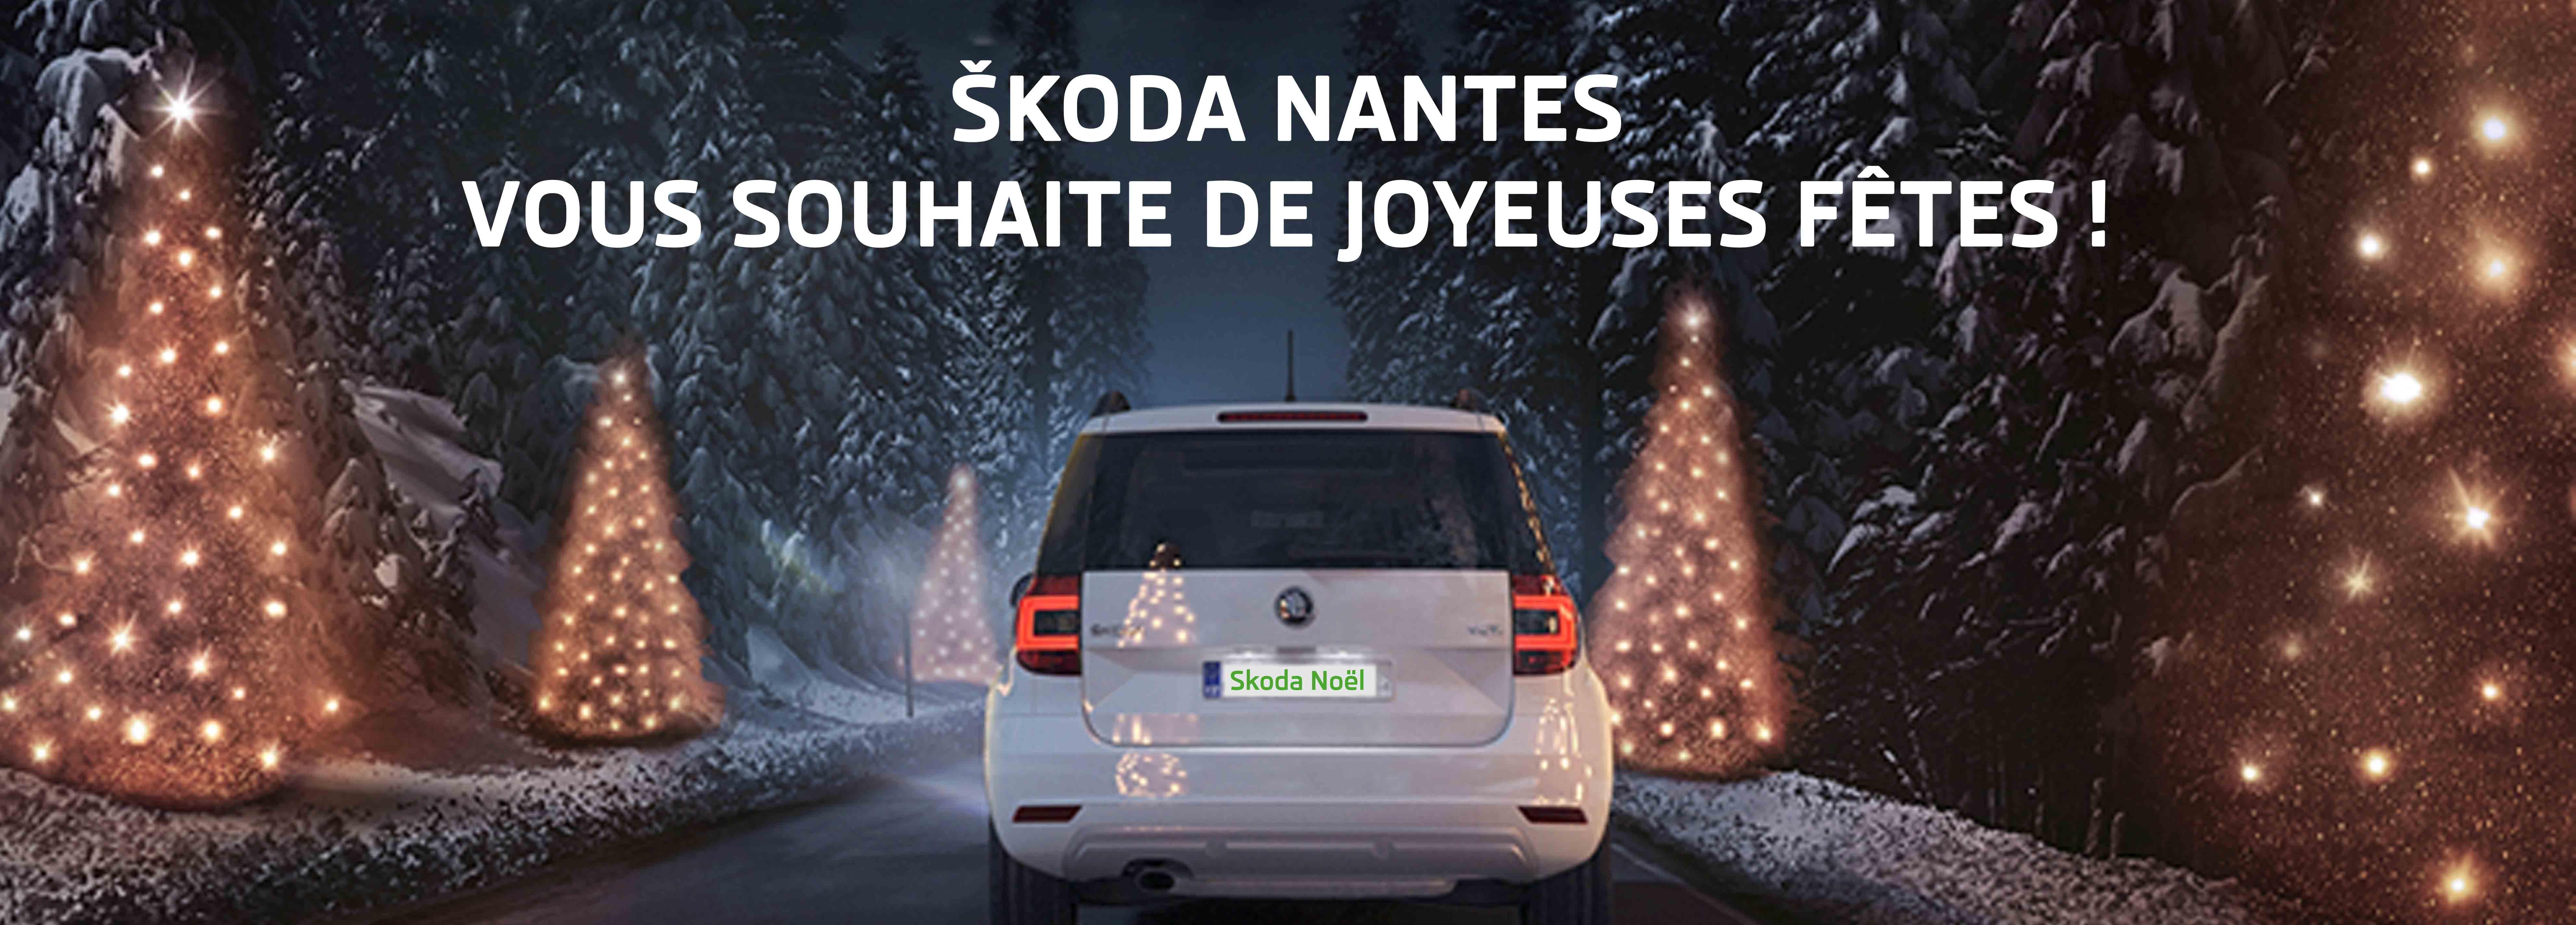 Skoda nantes concessionnaire garage loire atlantique 44 for Garage renault alma rennes horaires